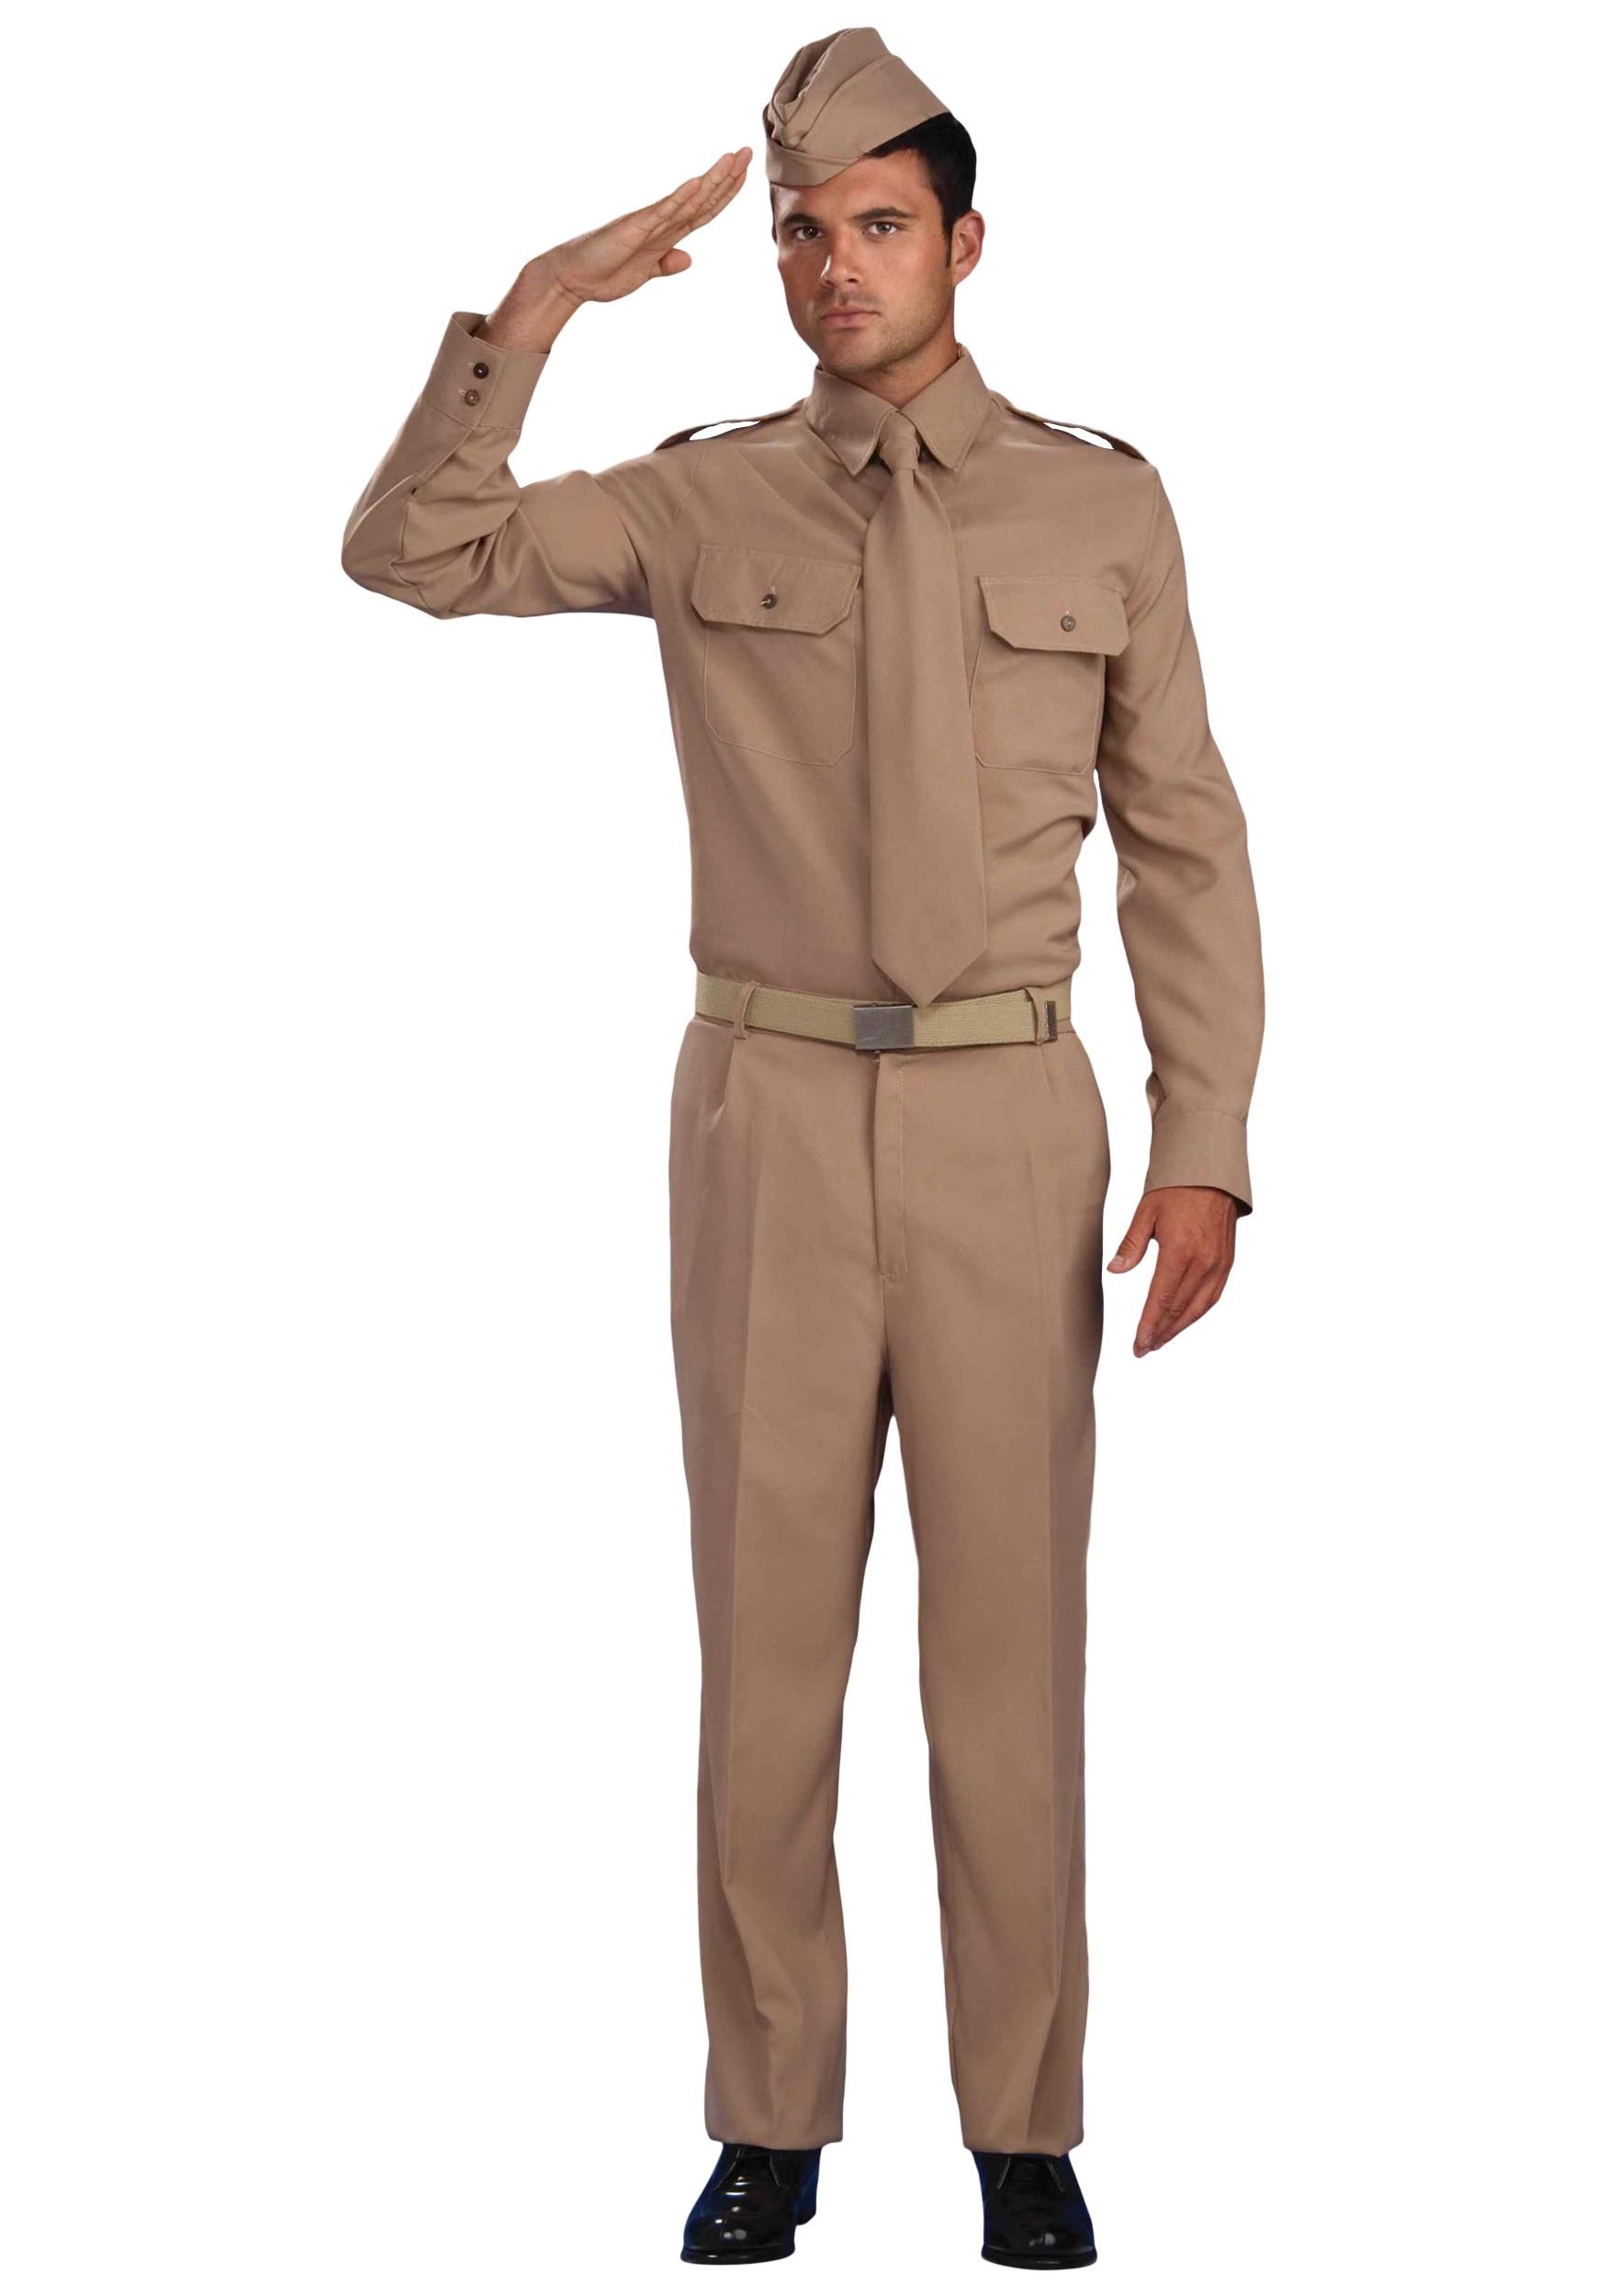 sc 1 st  Halloween Costumes UK & WW2 Army Costume